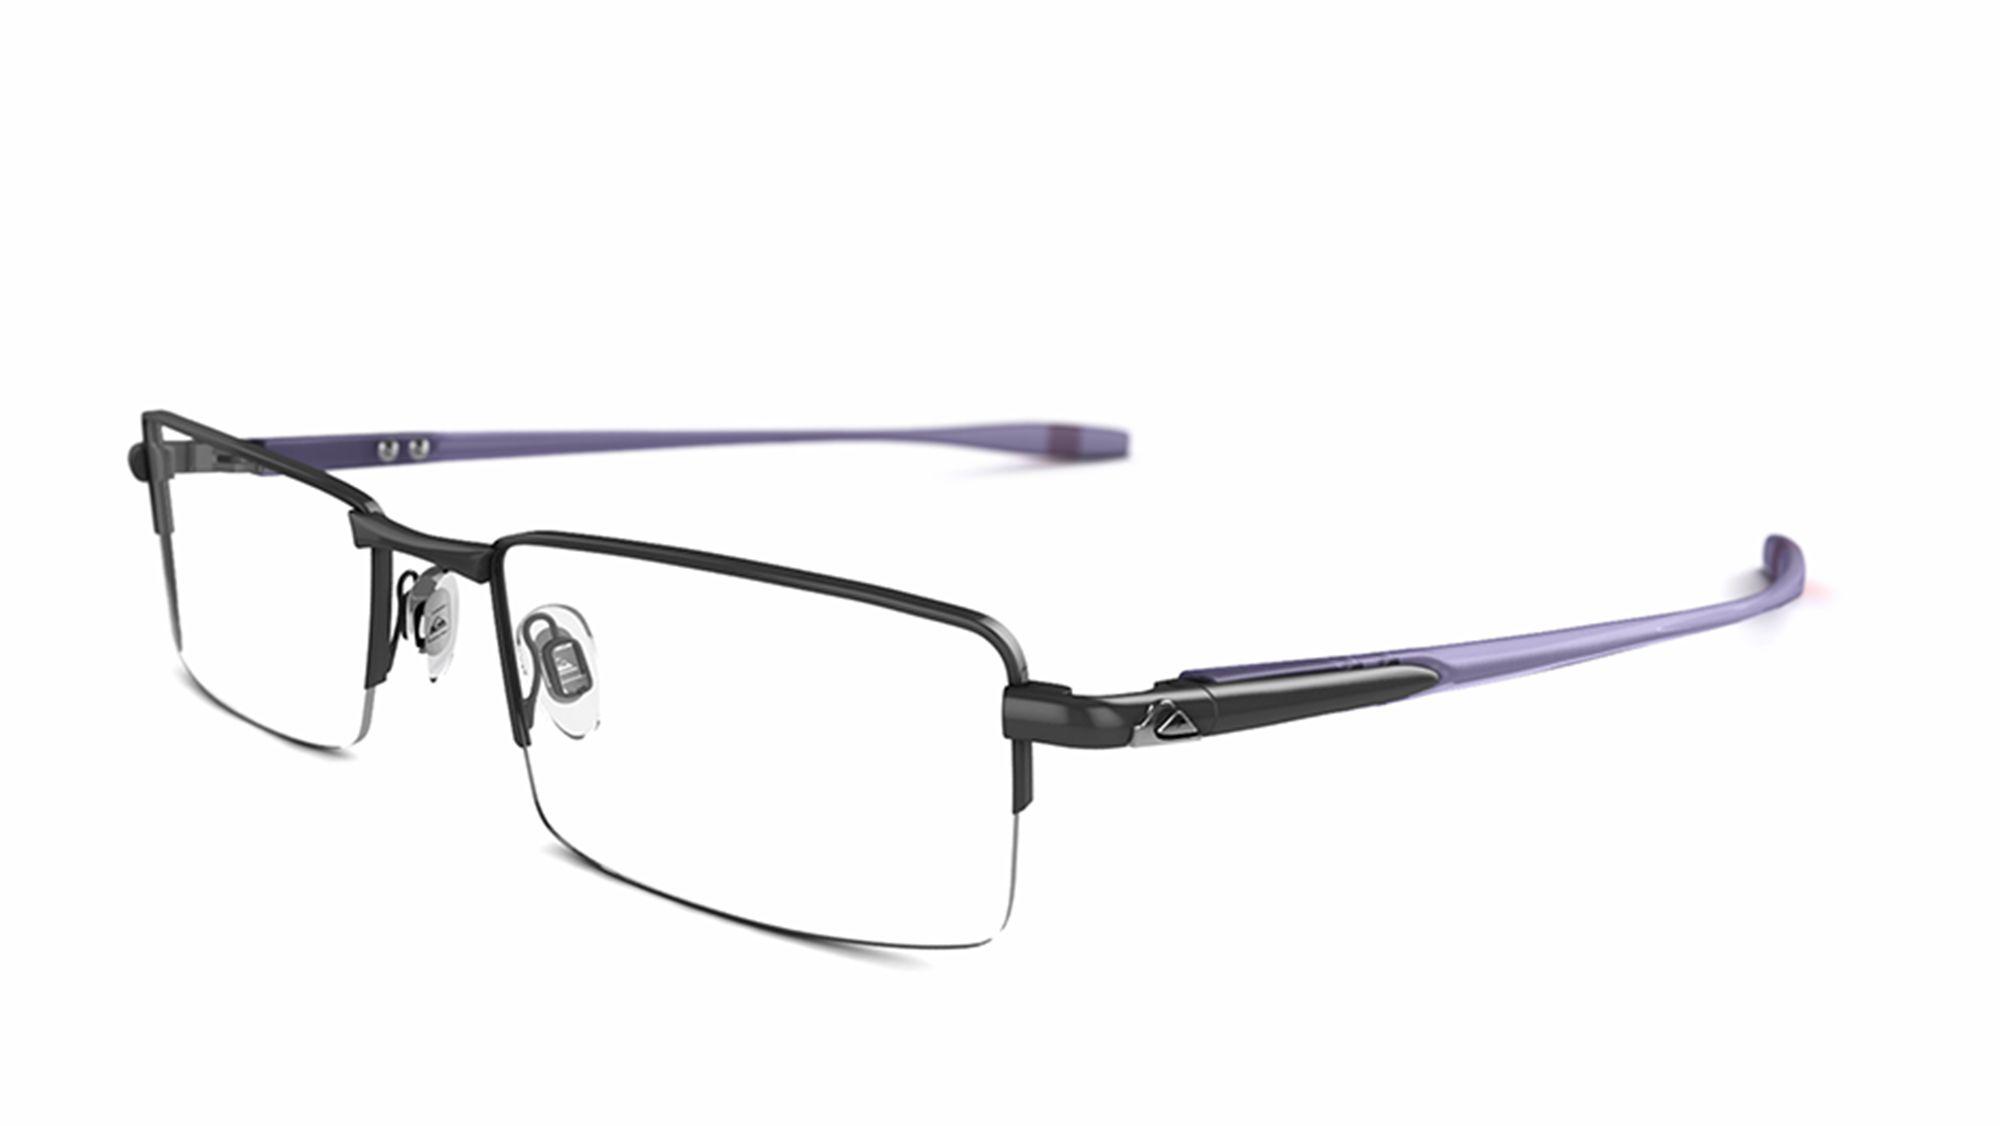 acc98930ac205 QUIKSILVER 7 Glasses by Quiksilver